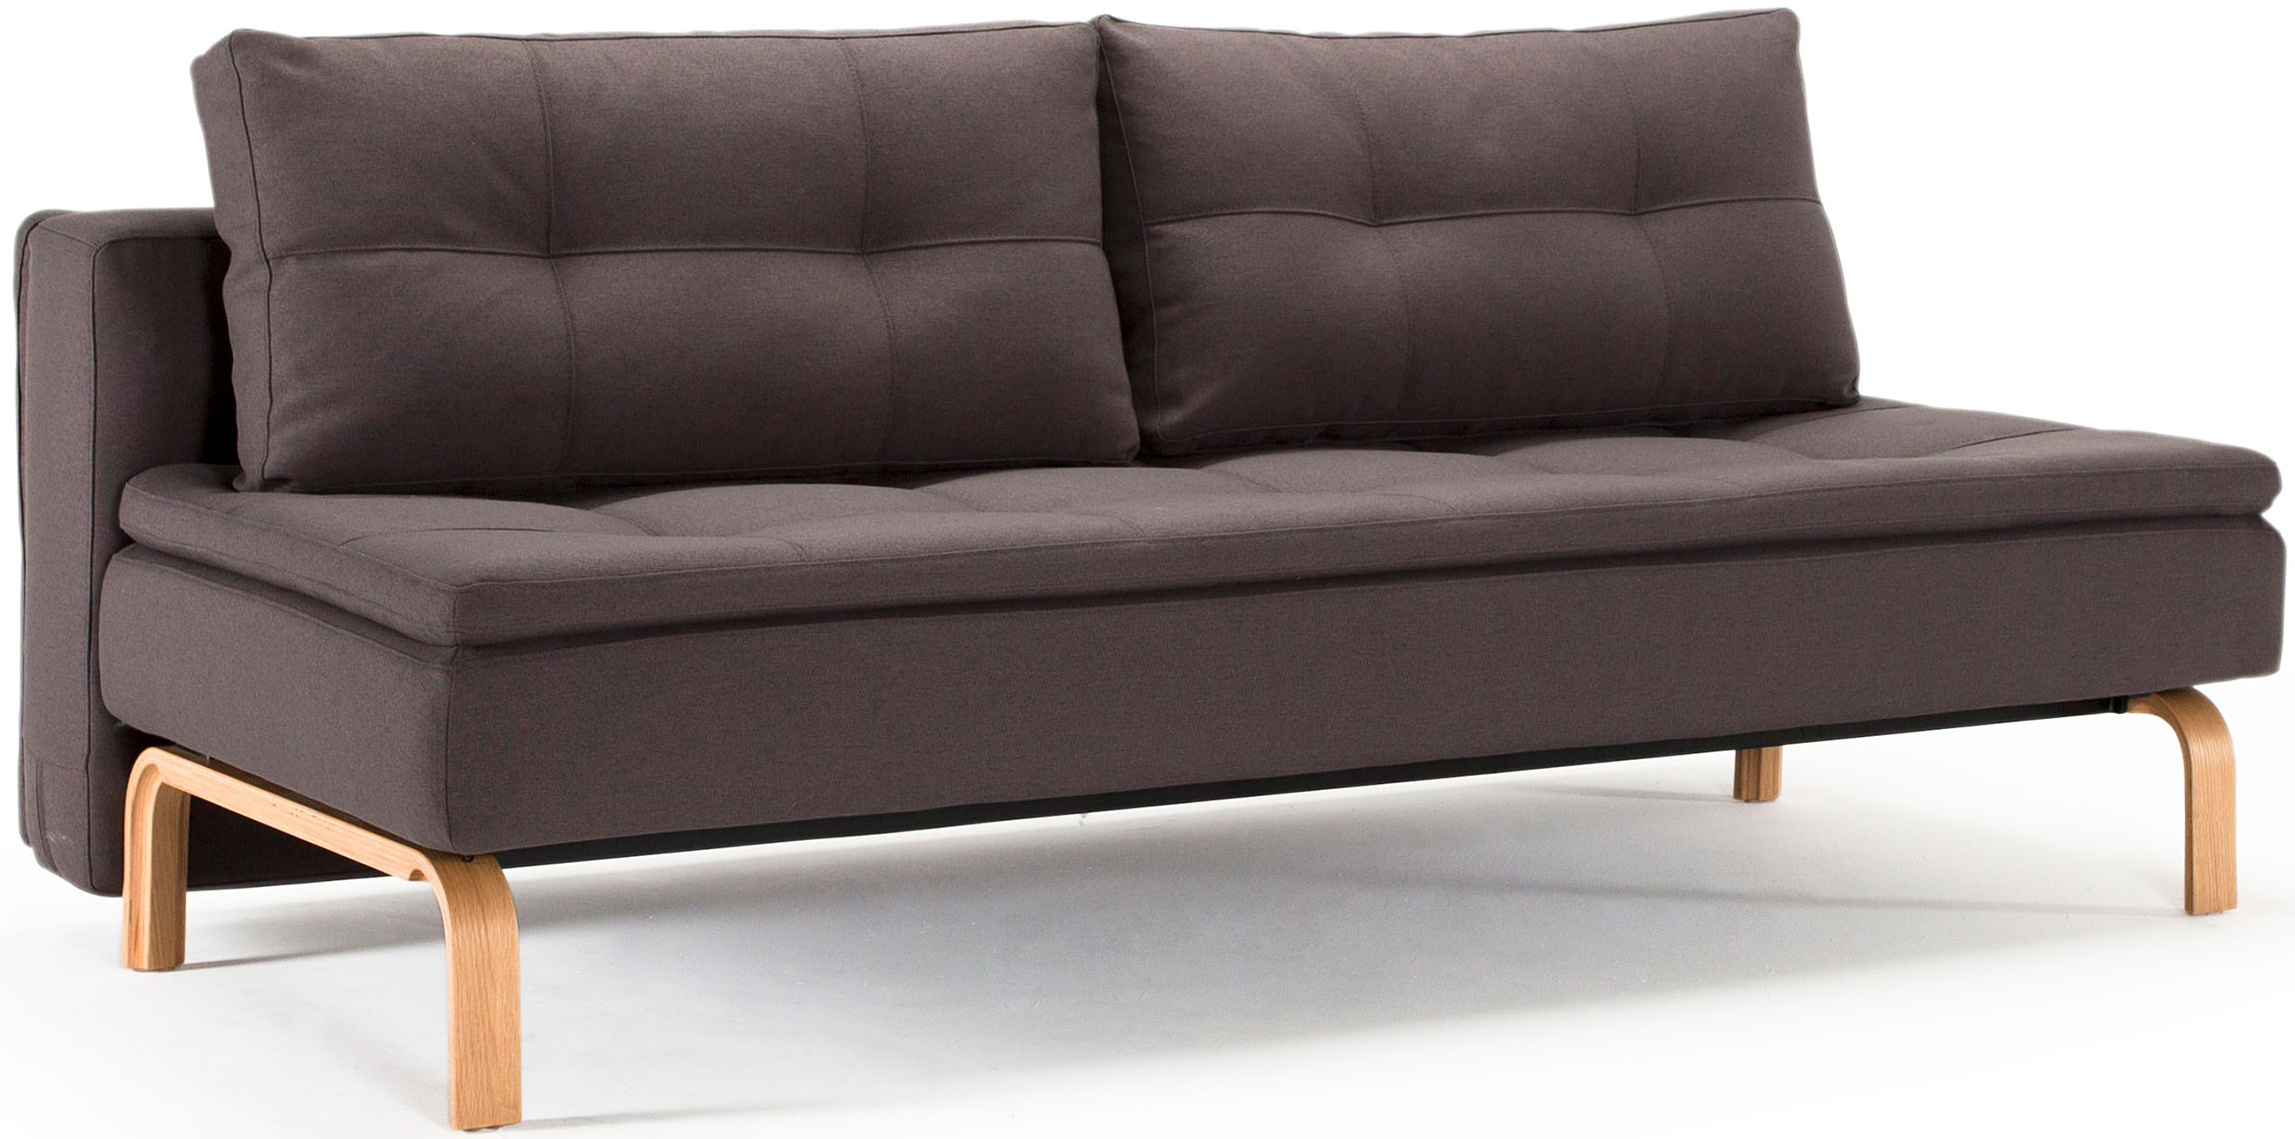 innovation dual sofa oak legs